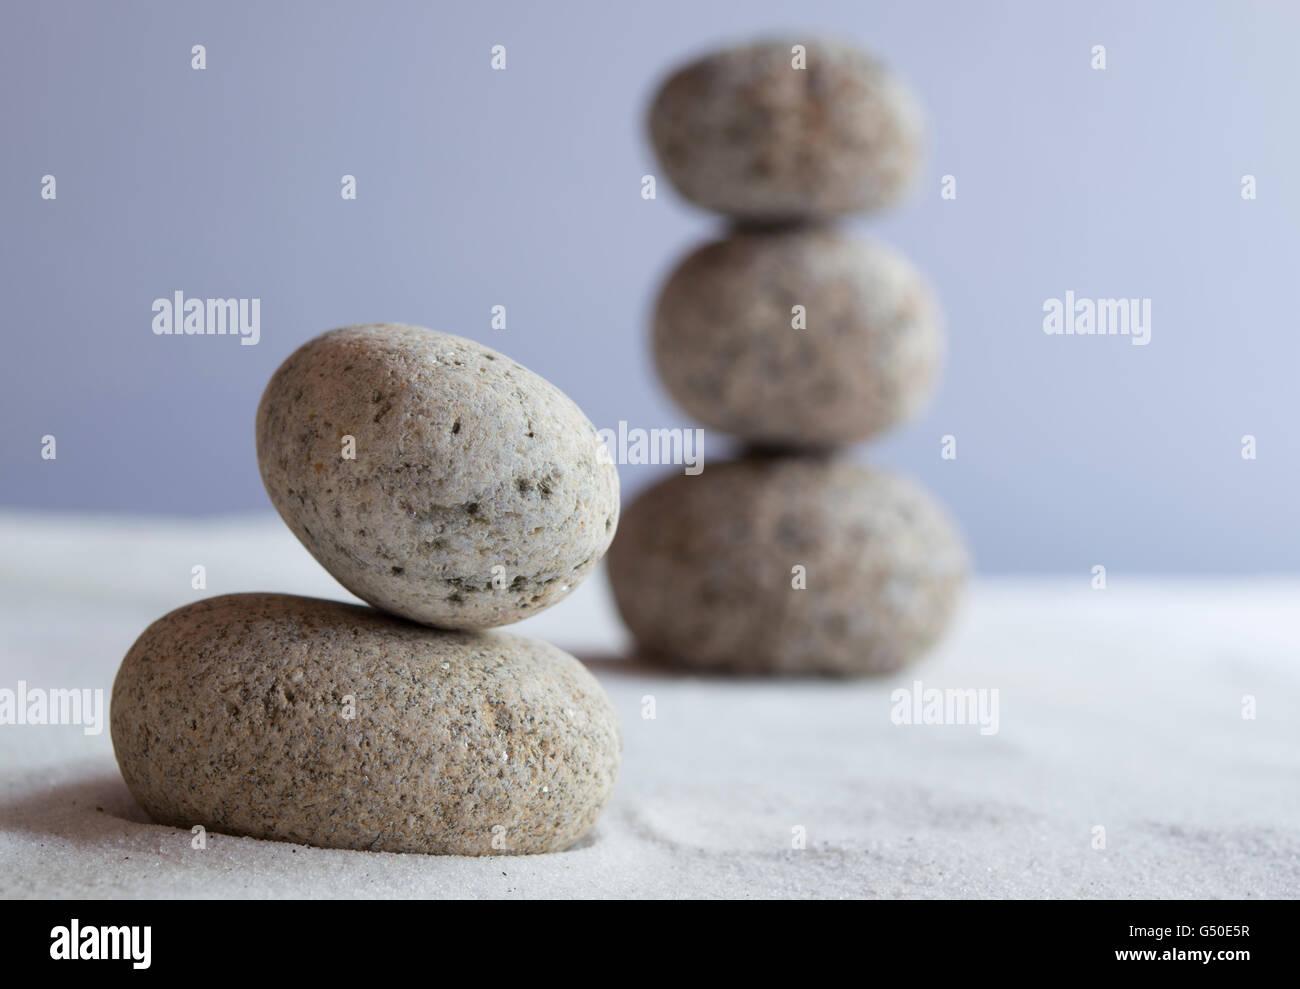 Pietre meditativo in equilibrio sulla sabbia bianca Foto Stock